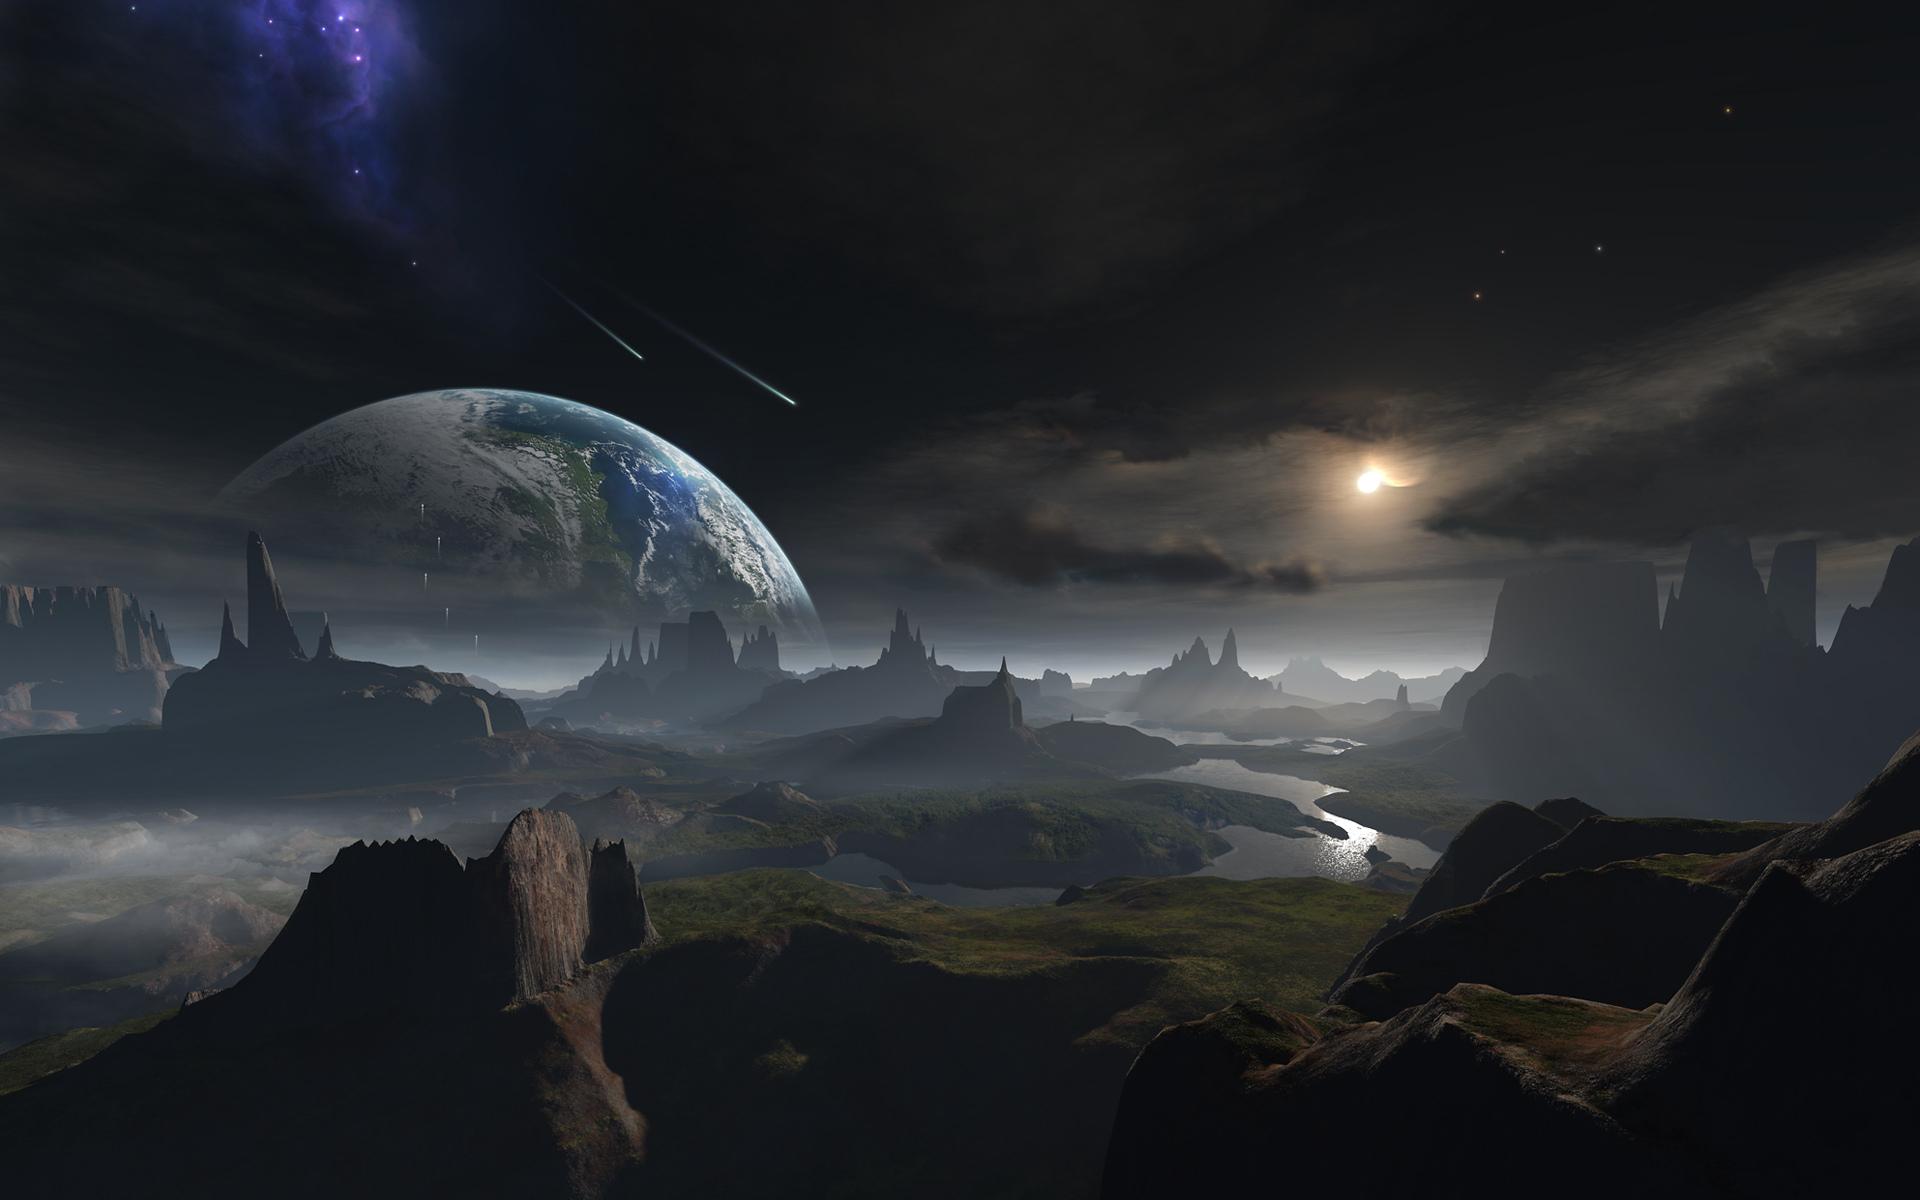 Sci Fi Wallpaper 2560x1440: Sci Fi Landscape Wallpaper HD